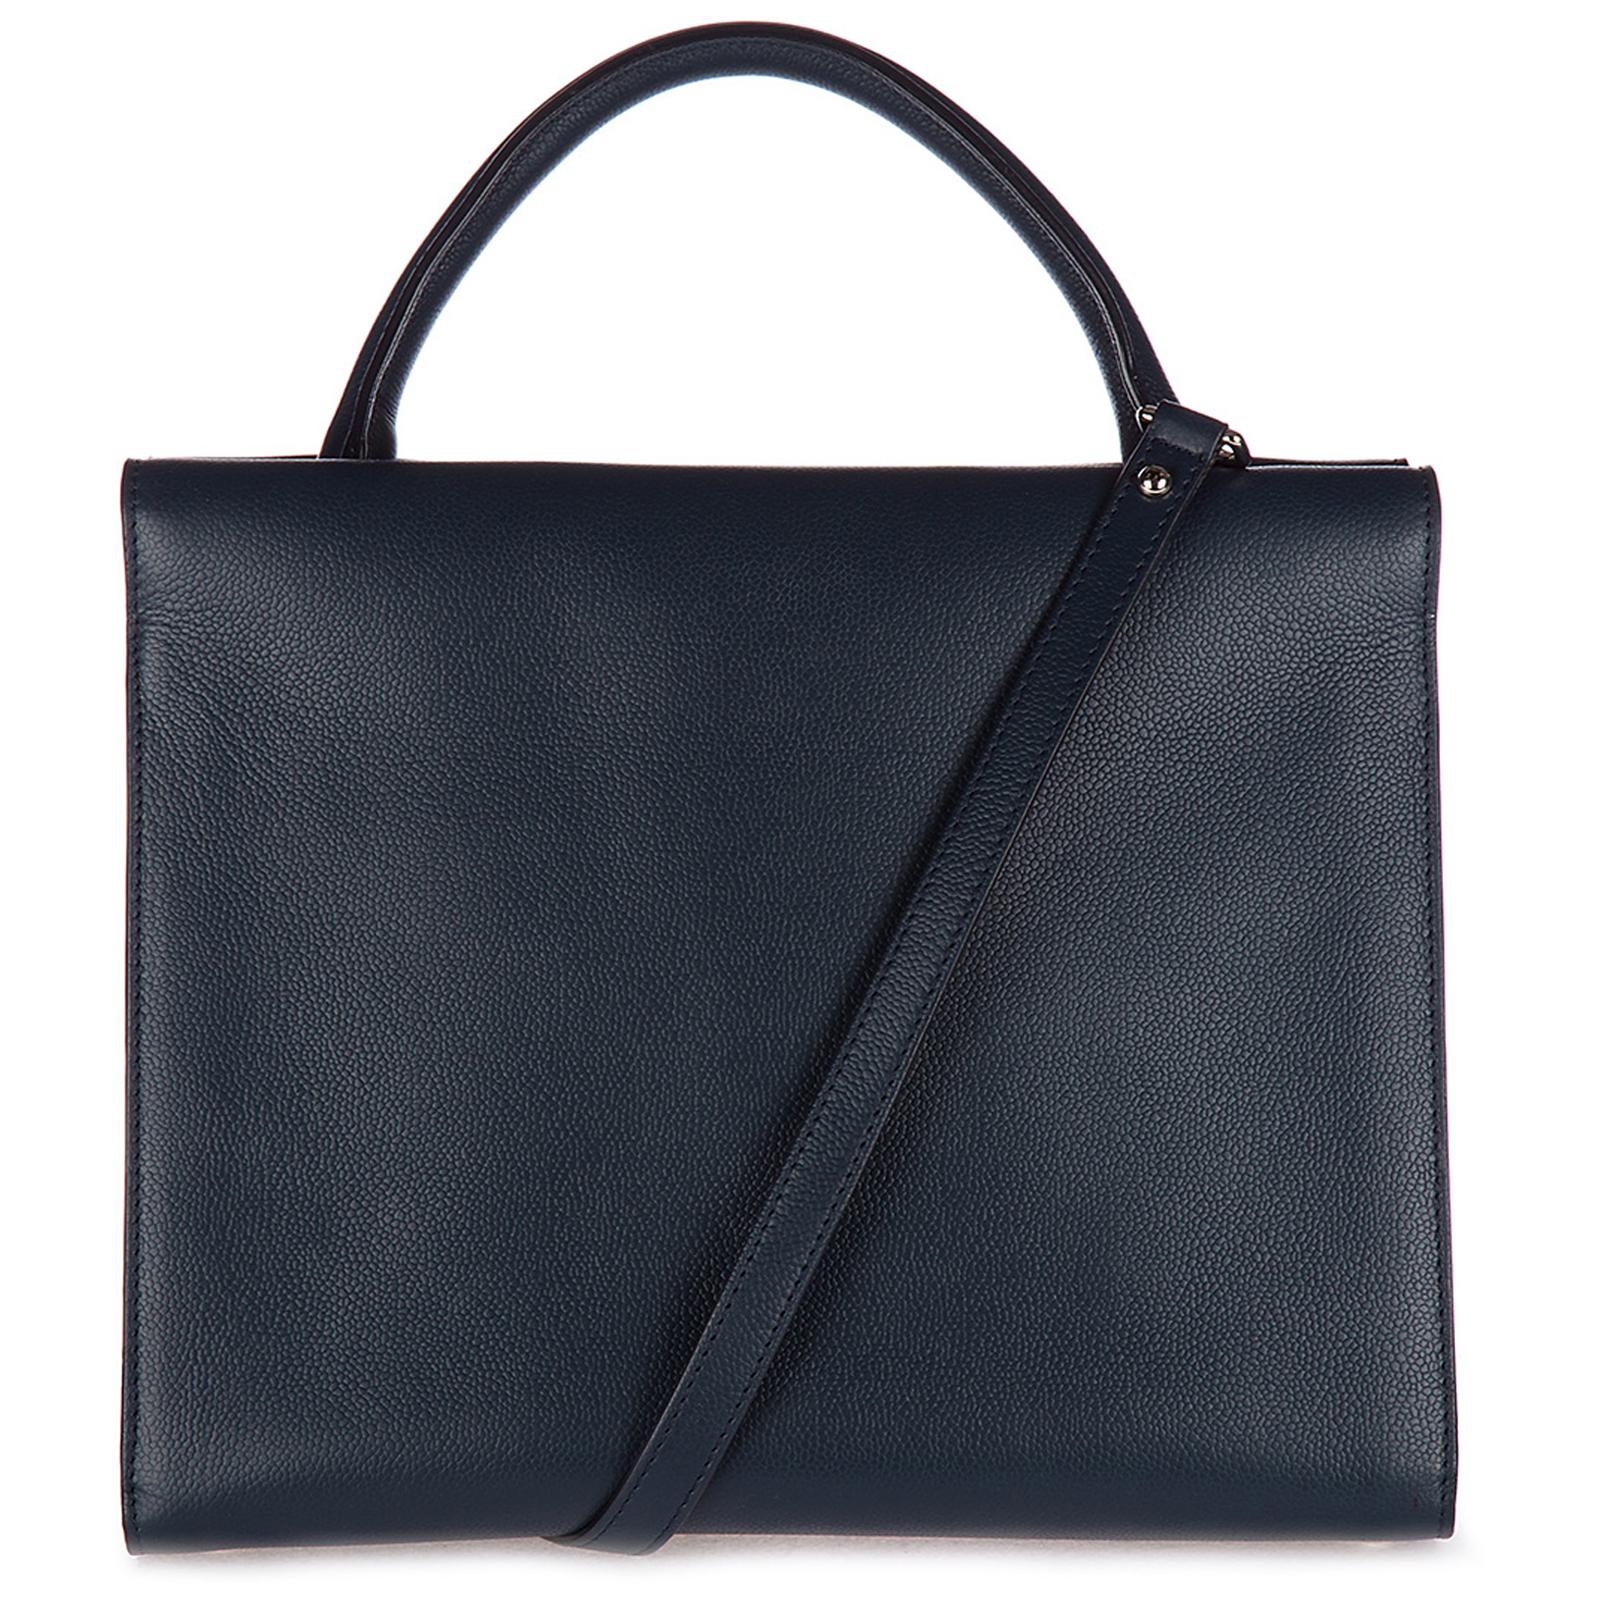 Women's leather handbag shopping bag purse paris